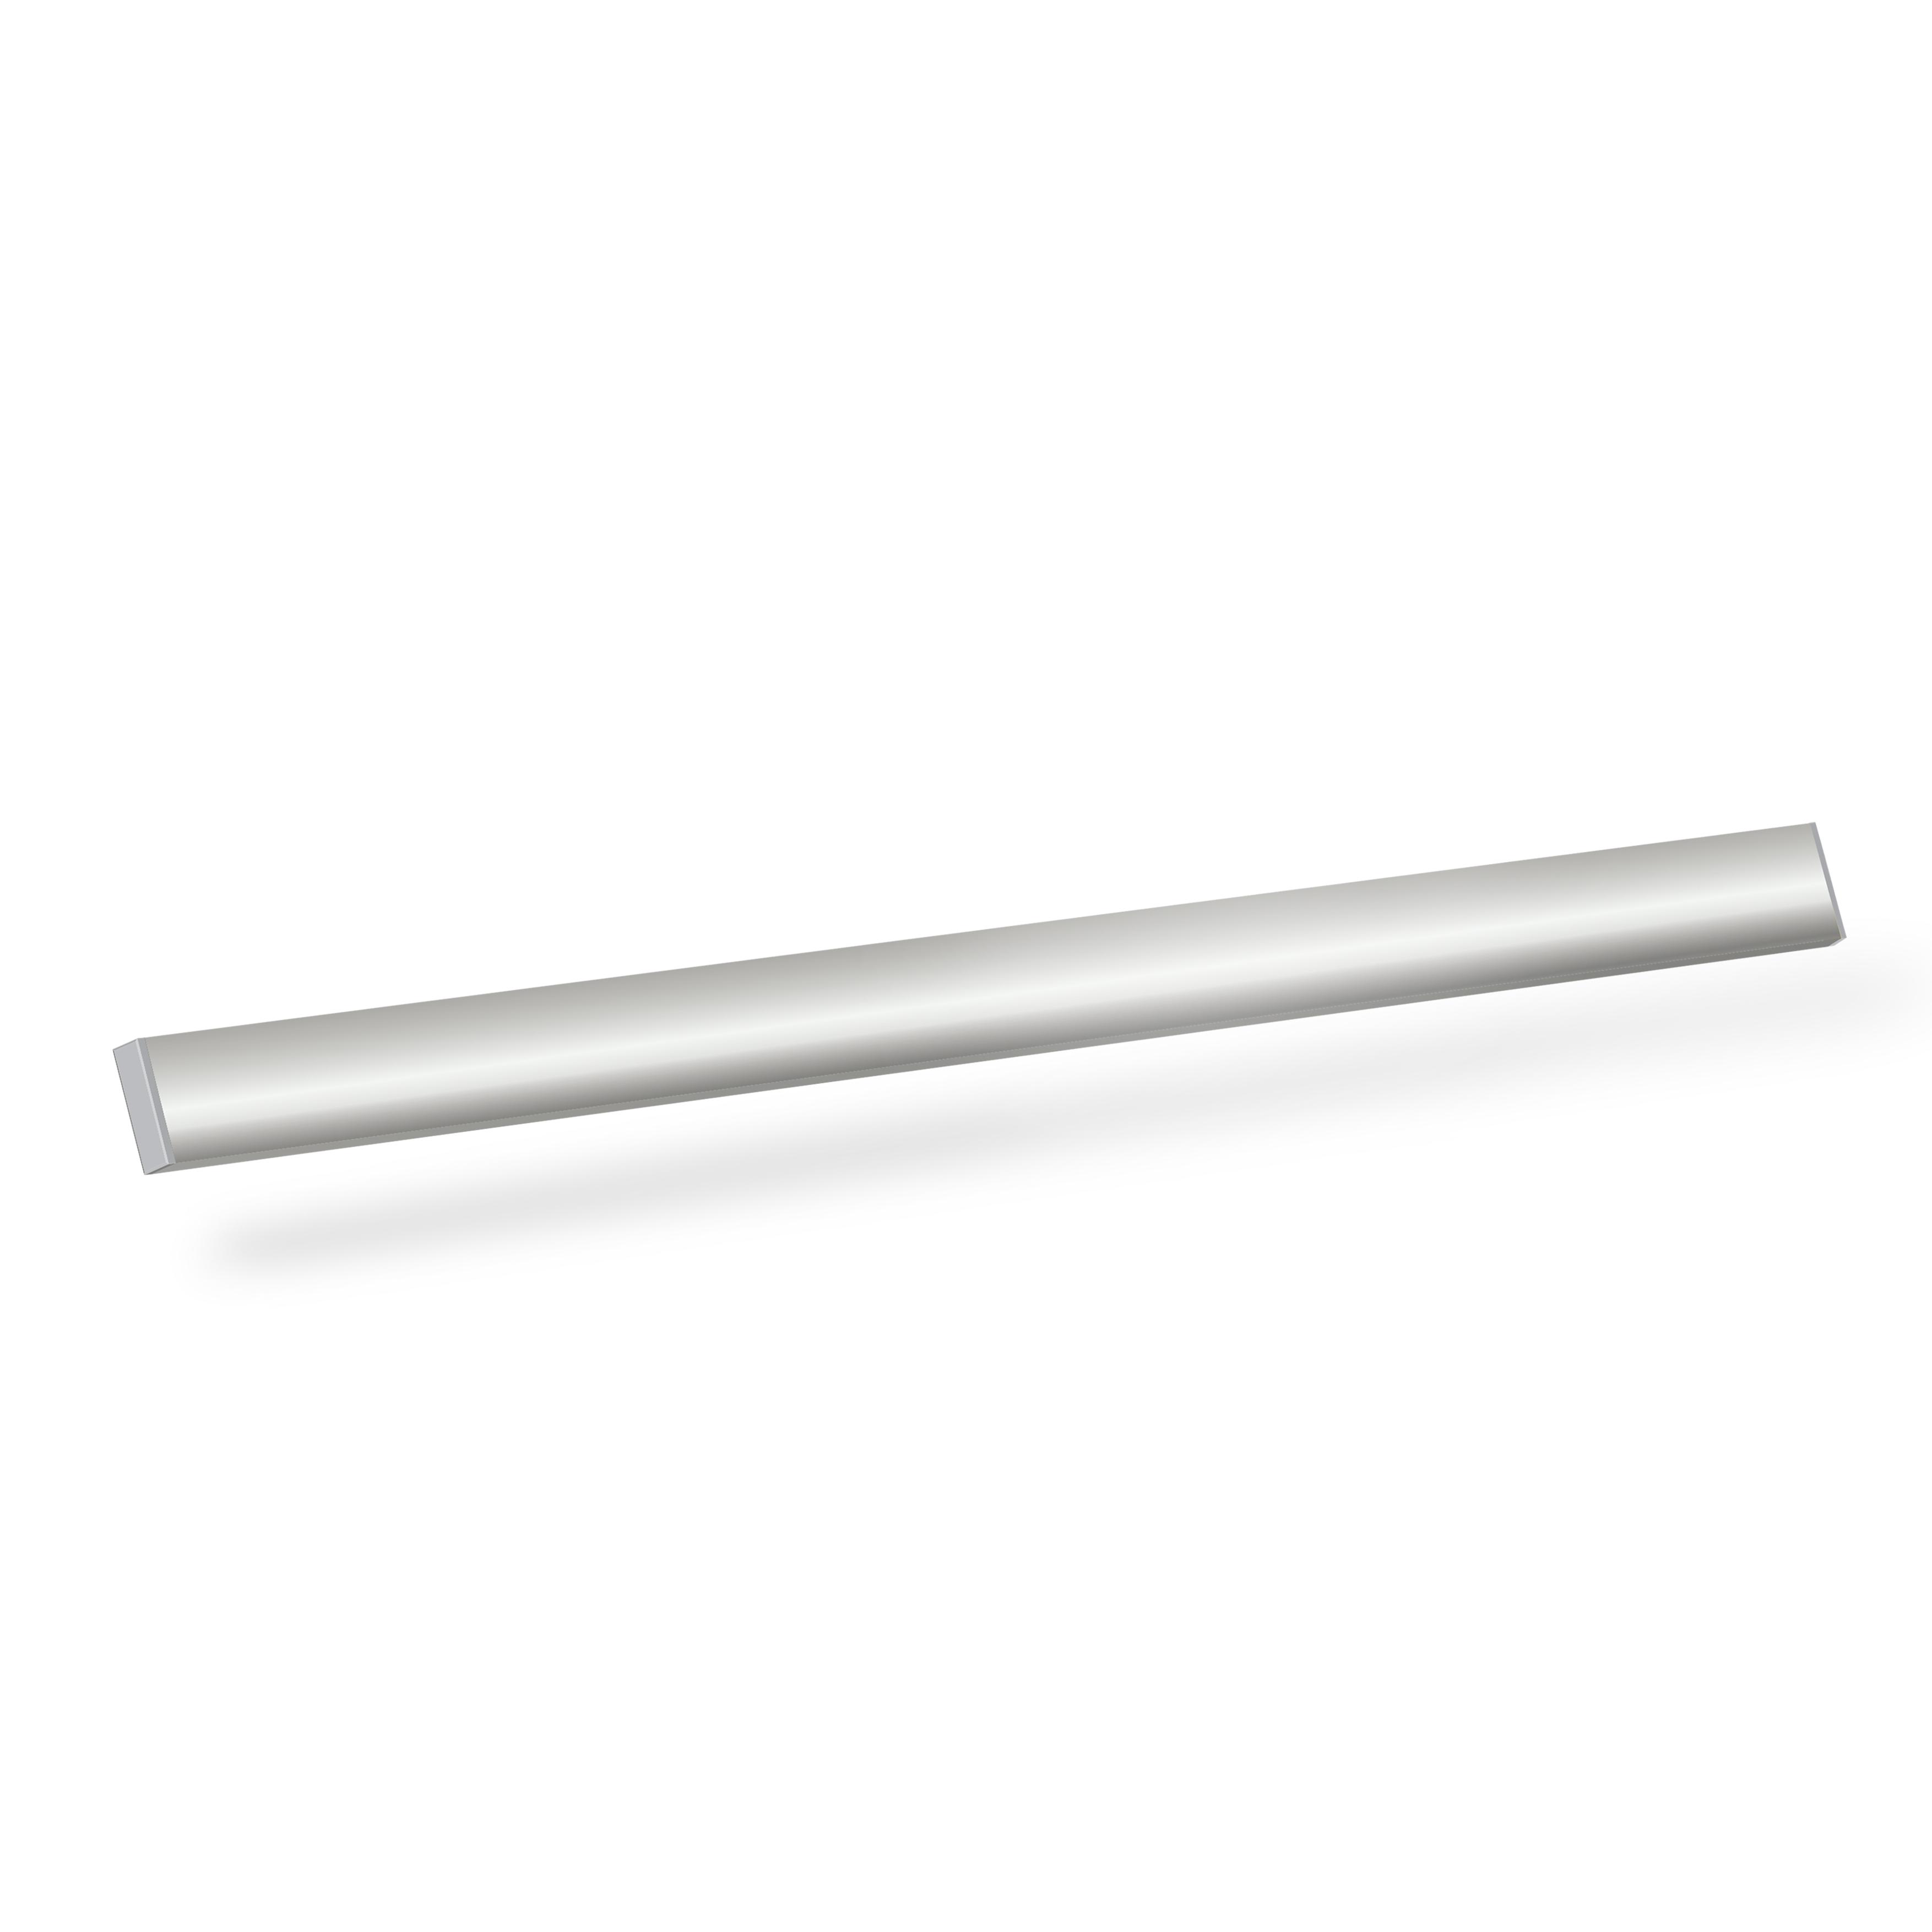 Origin White Roller Blinds With Chrome Bottom Bar 3D  Closeup